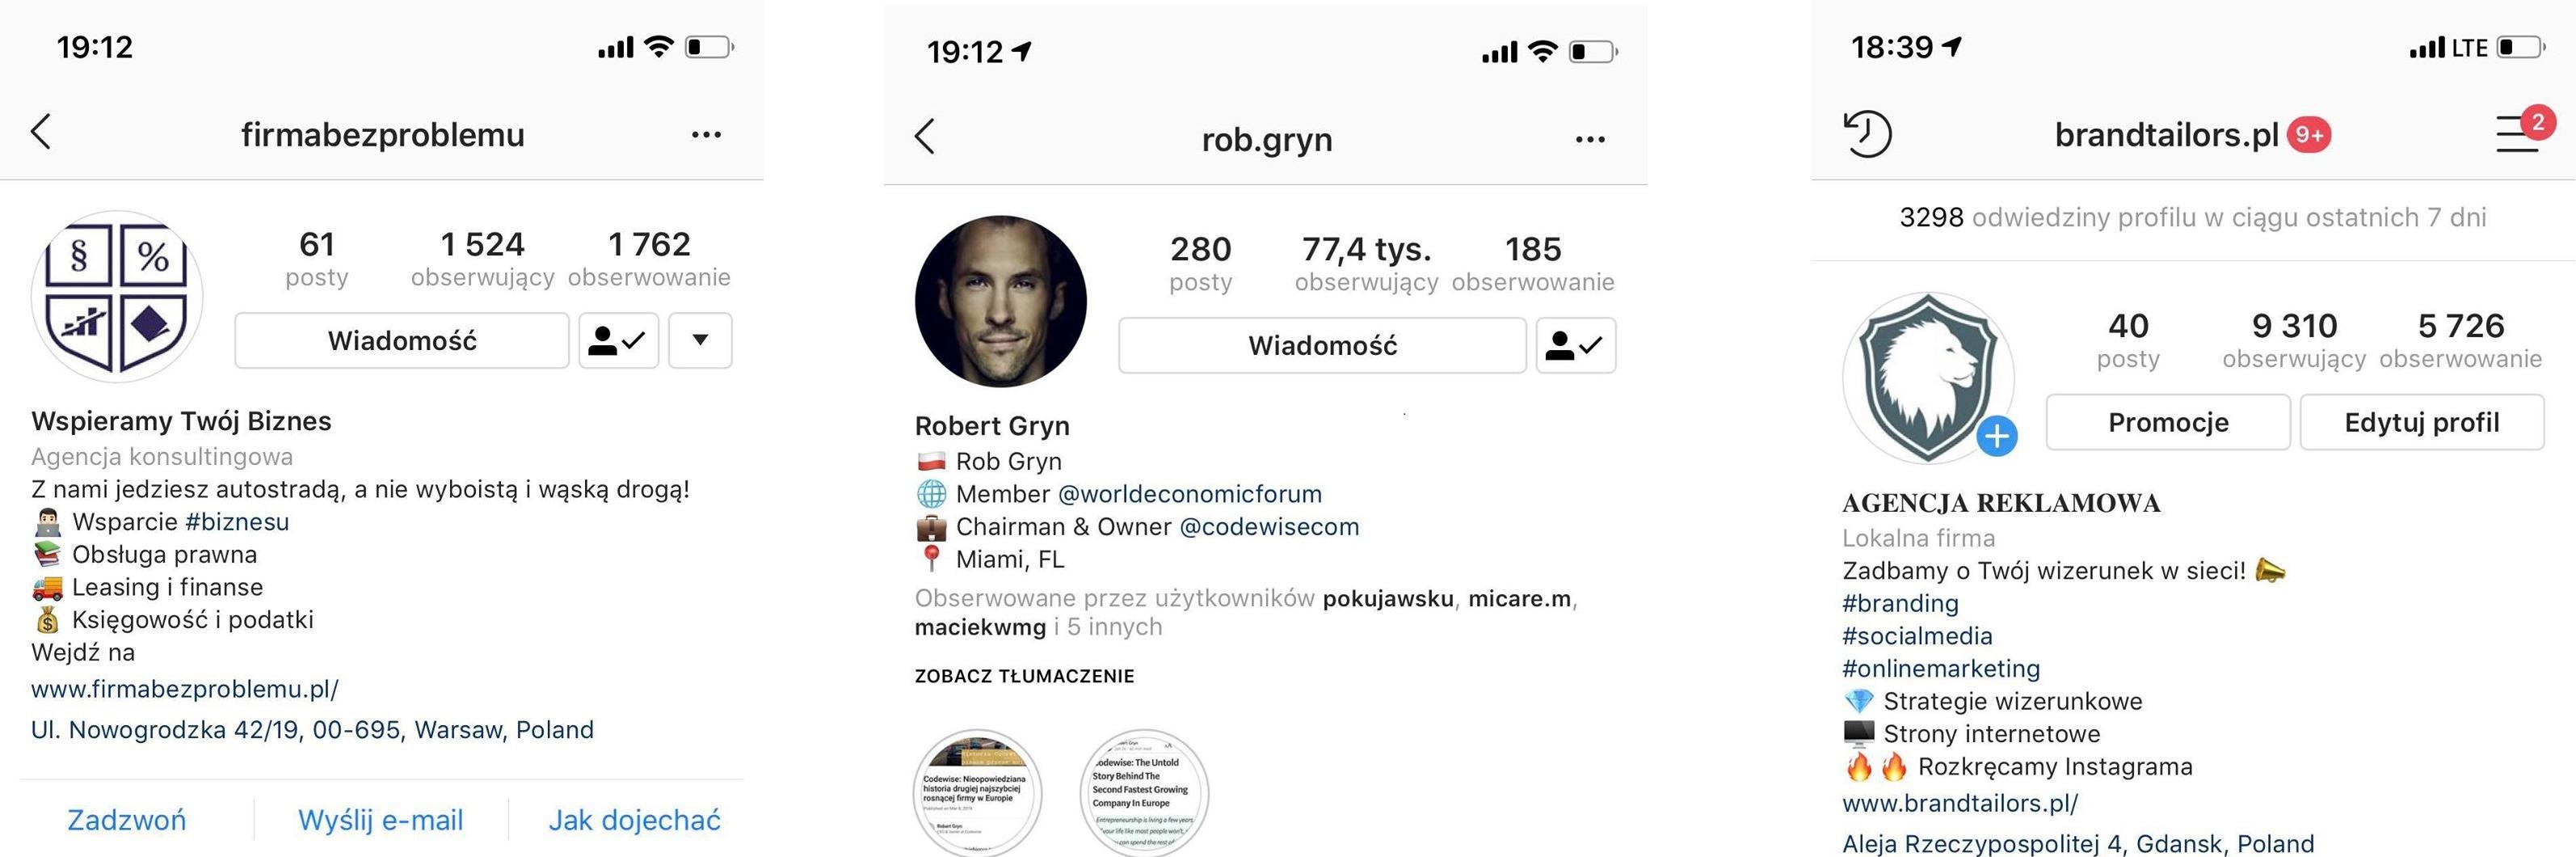 opis-bio-profilu-instagram